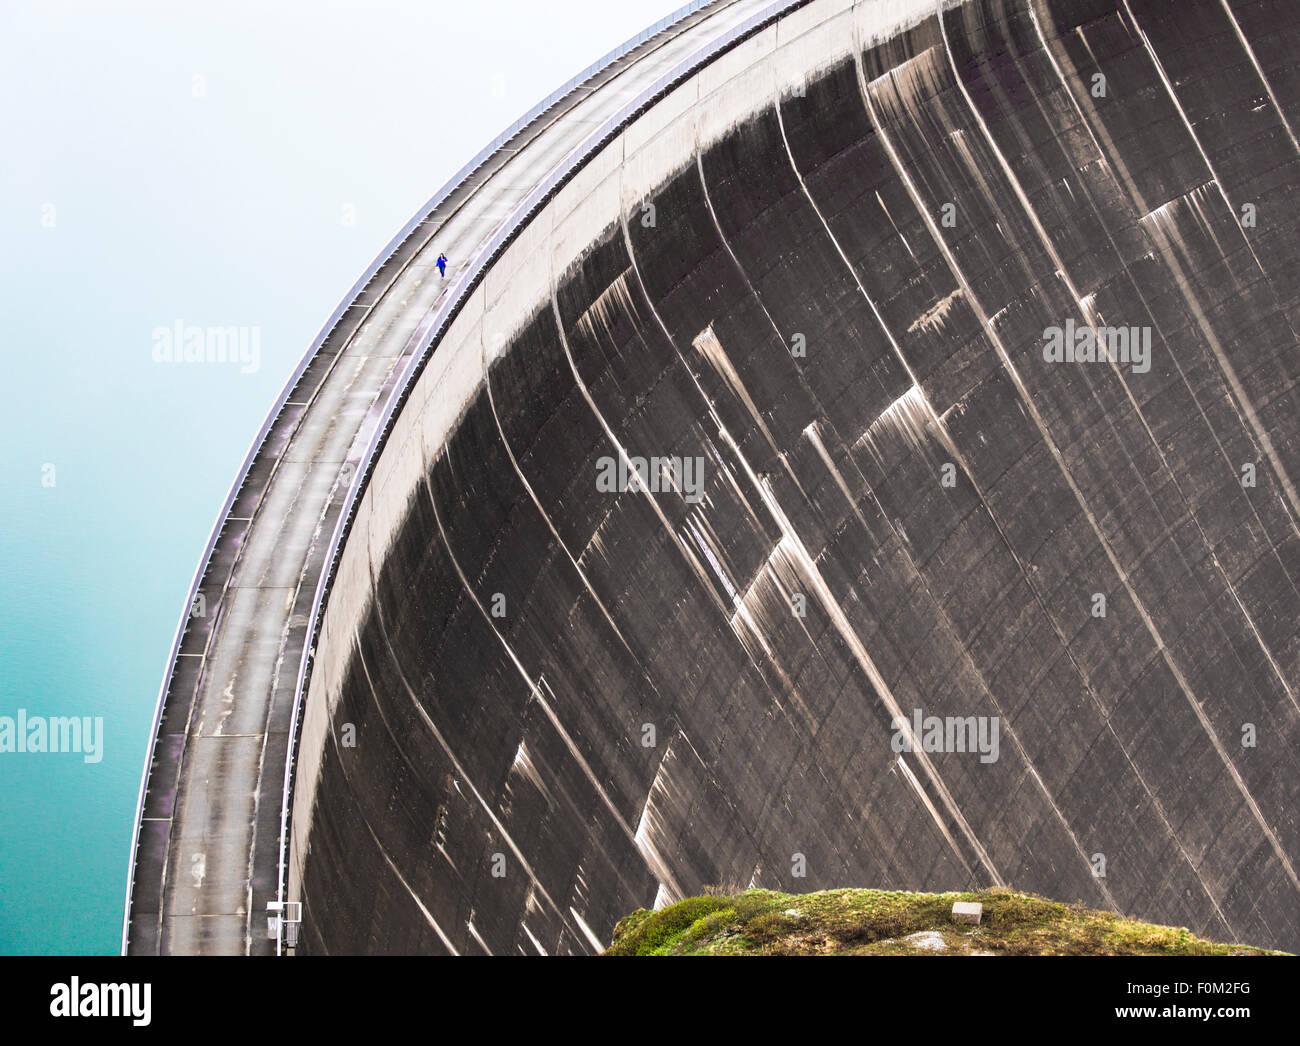 Mooserboden reservoir with Mooser dam, Kaprun, Austria - Stock Image